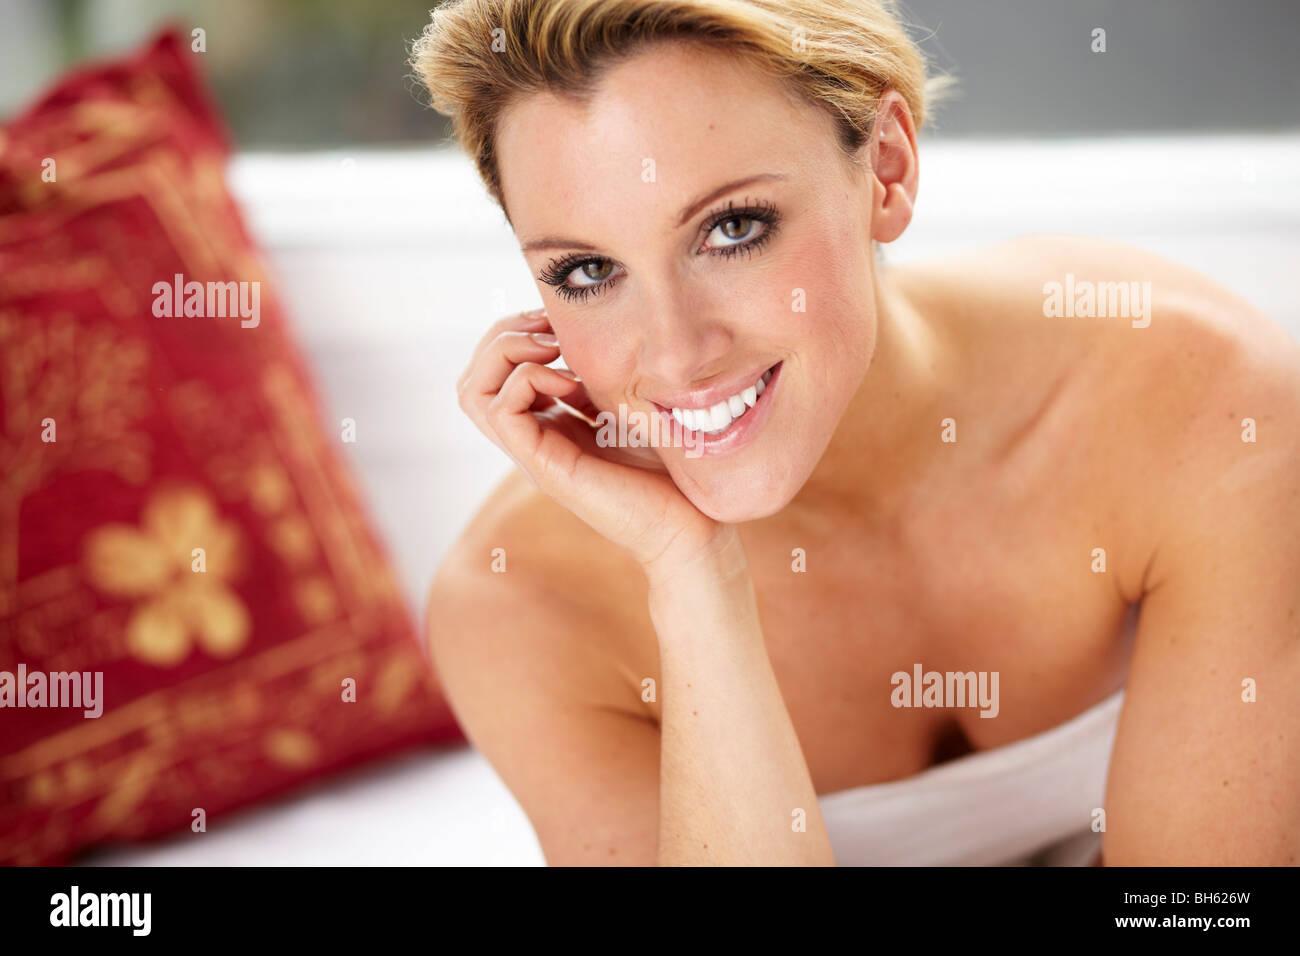 Portrait of attractive blonde woman Photo Stock